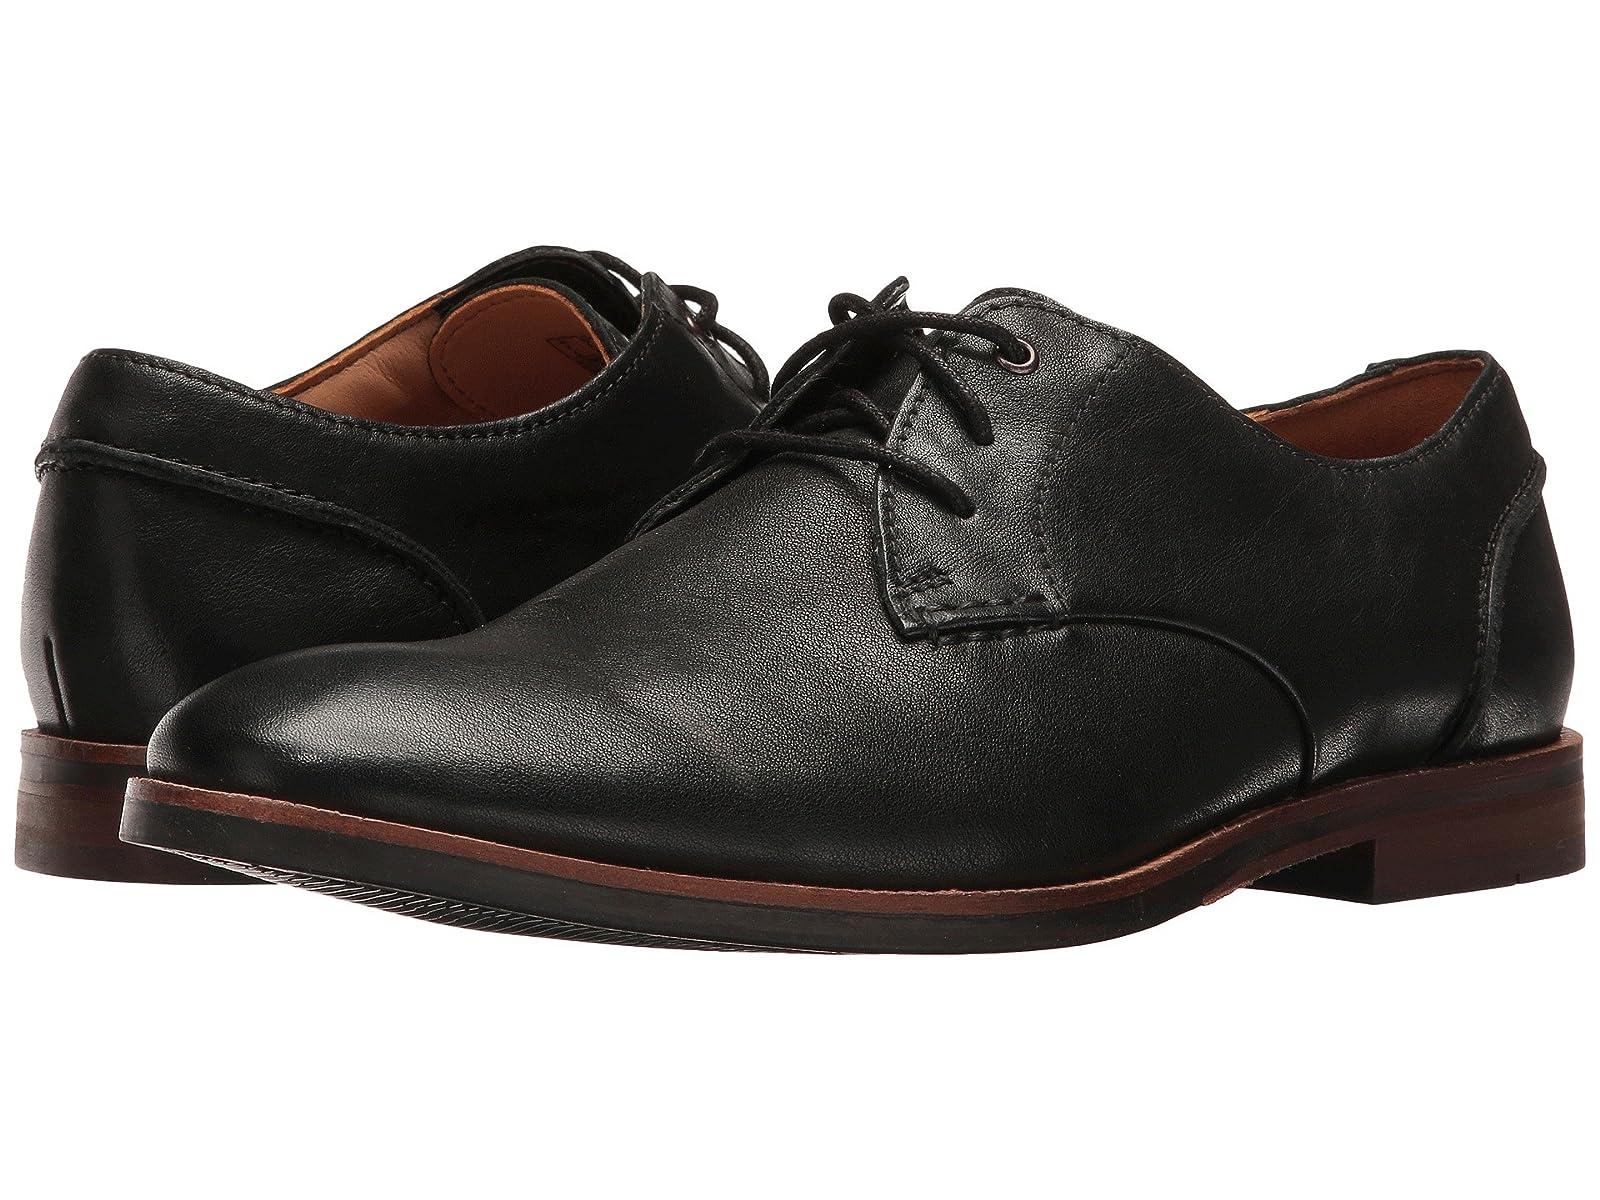 Clarks Broyd WalkAtmospheric grades have affordable shoes